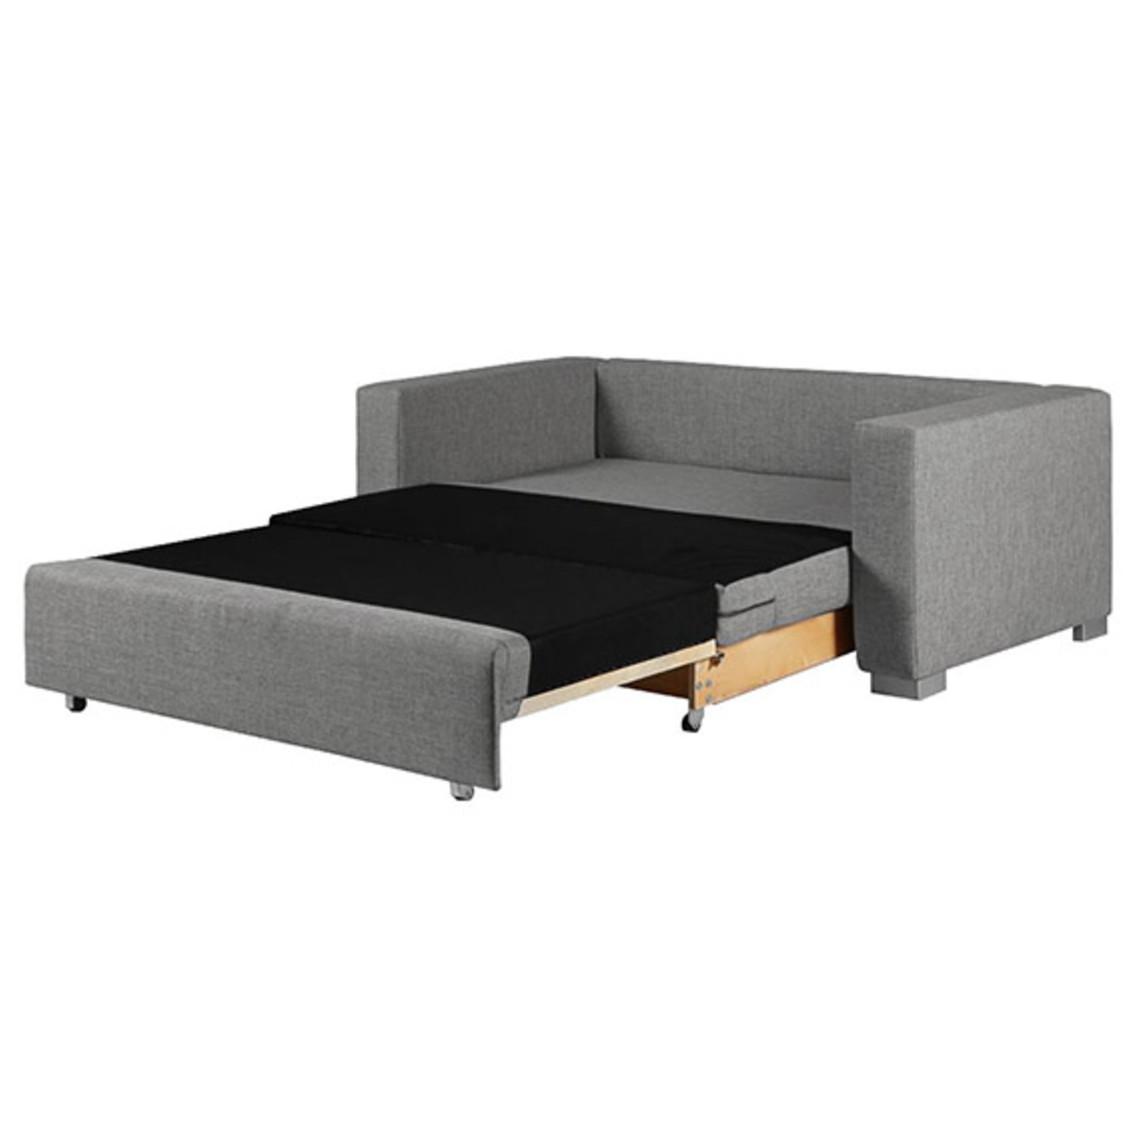 Sofa Typen Im Uberblick Welche Sofatypen Gibt Es Home24